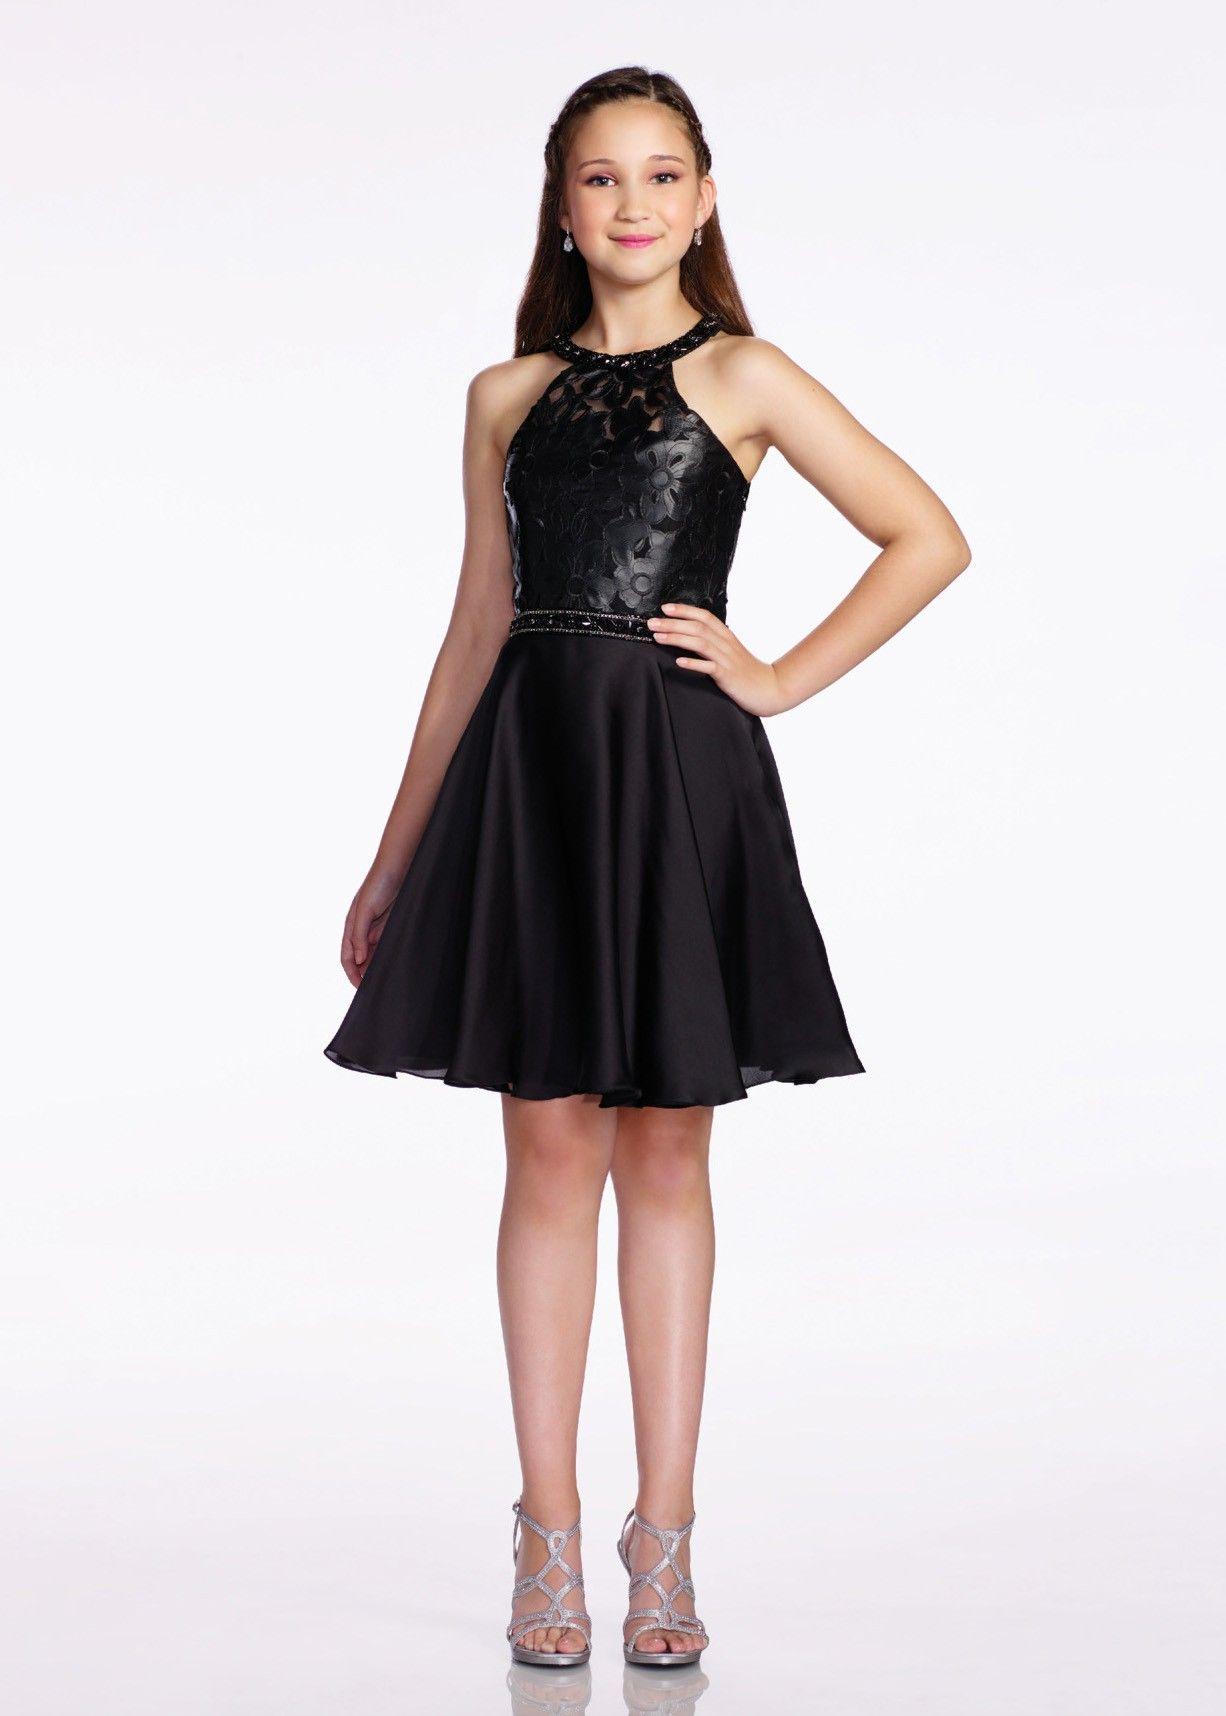 Lexie by Mon Cheri TW11675 Girls Faux Leather Party Dress